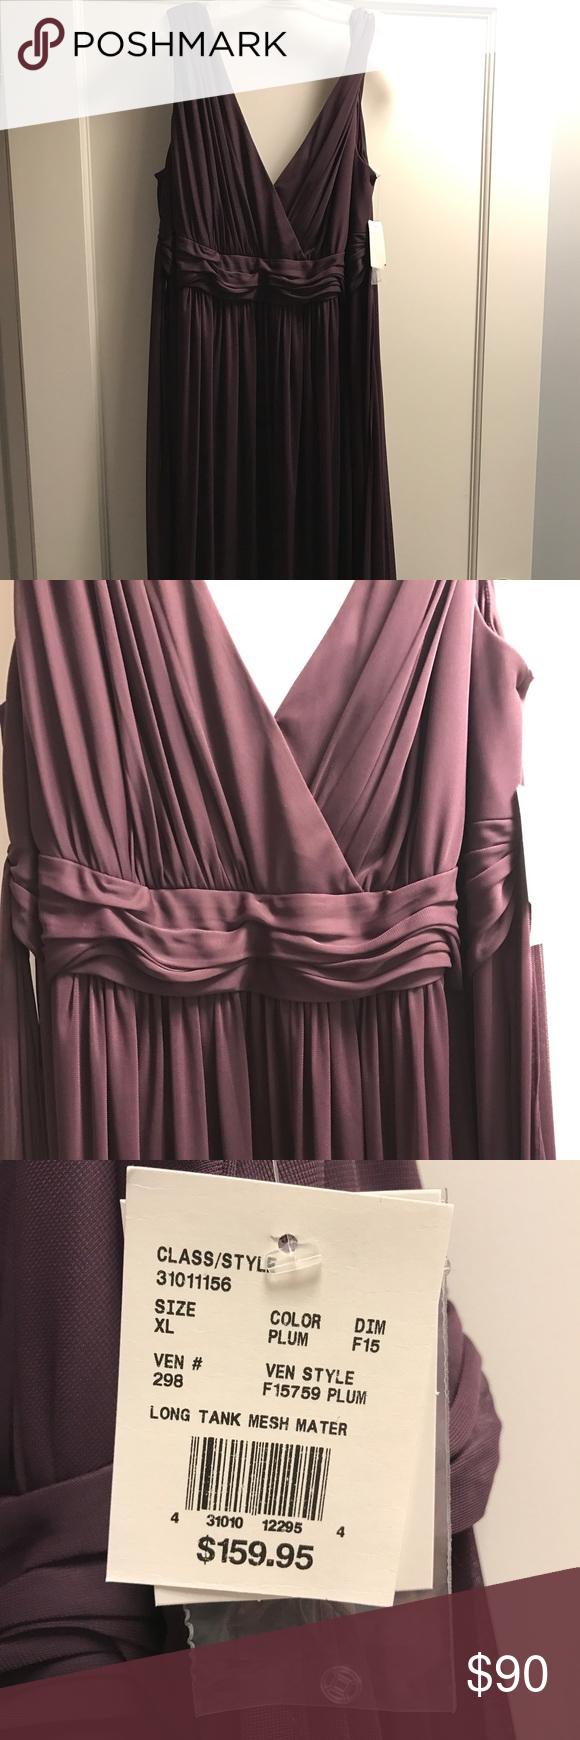 Davids bridal plum long tank mesh maternity dress nwt the o davids bridal plum long tank mesh maternity dress never been worn brand new davids ombrellifo Images